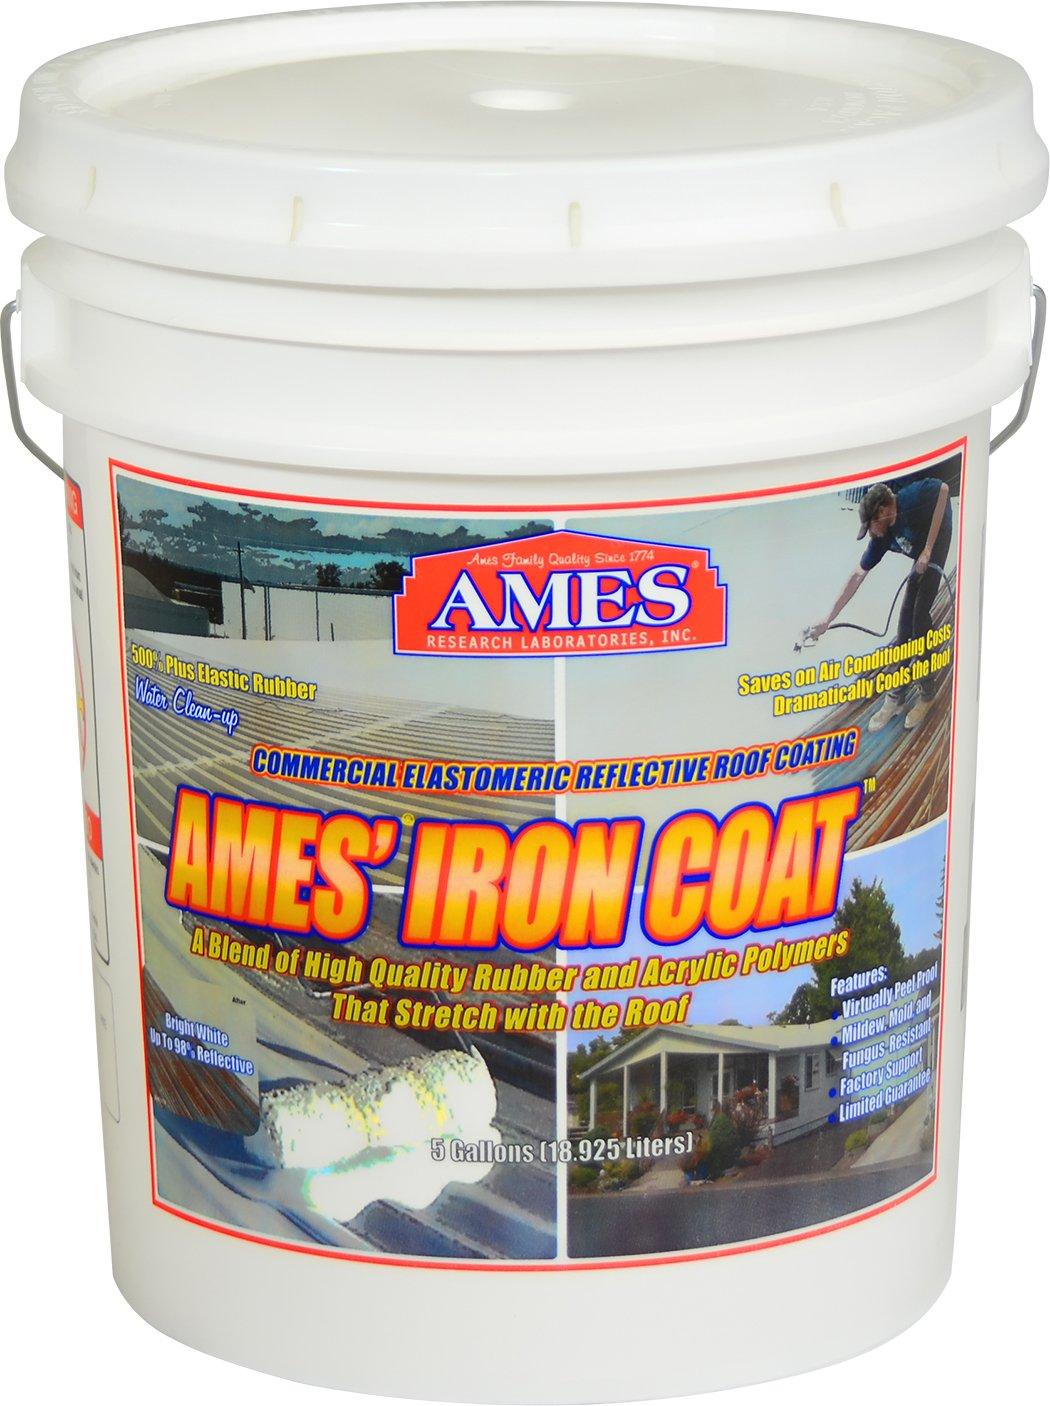 Ames IC5 5 Gallon Iron Roof Coating, White